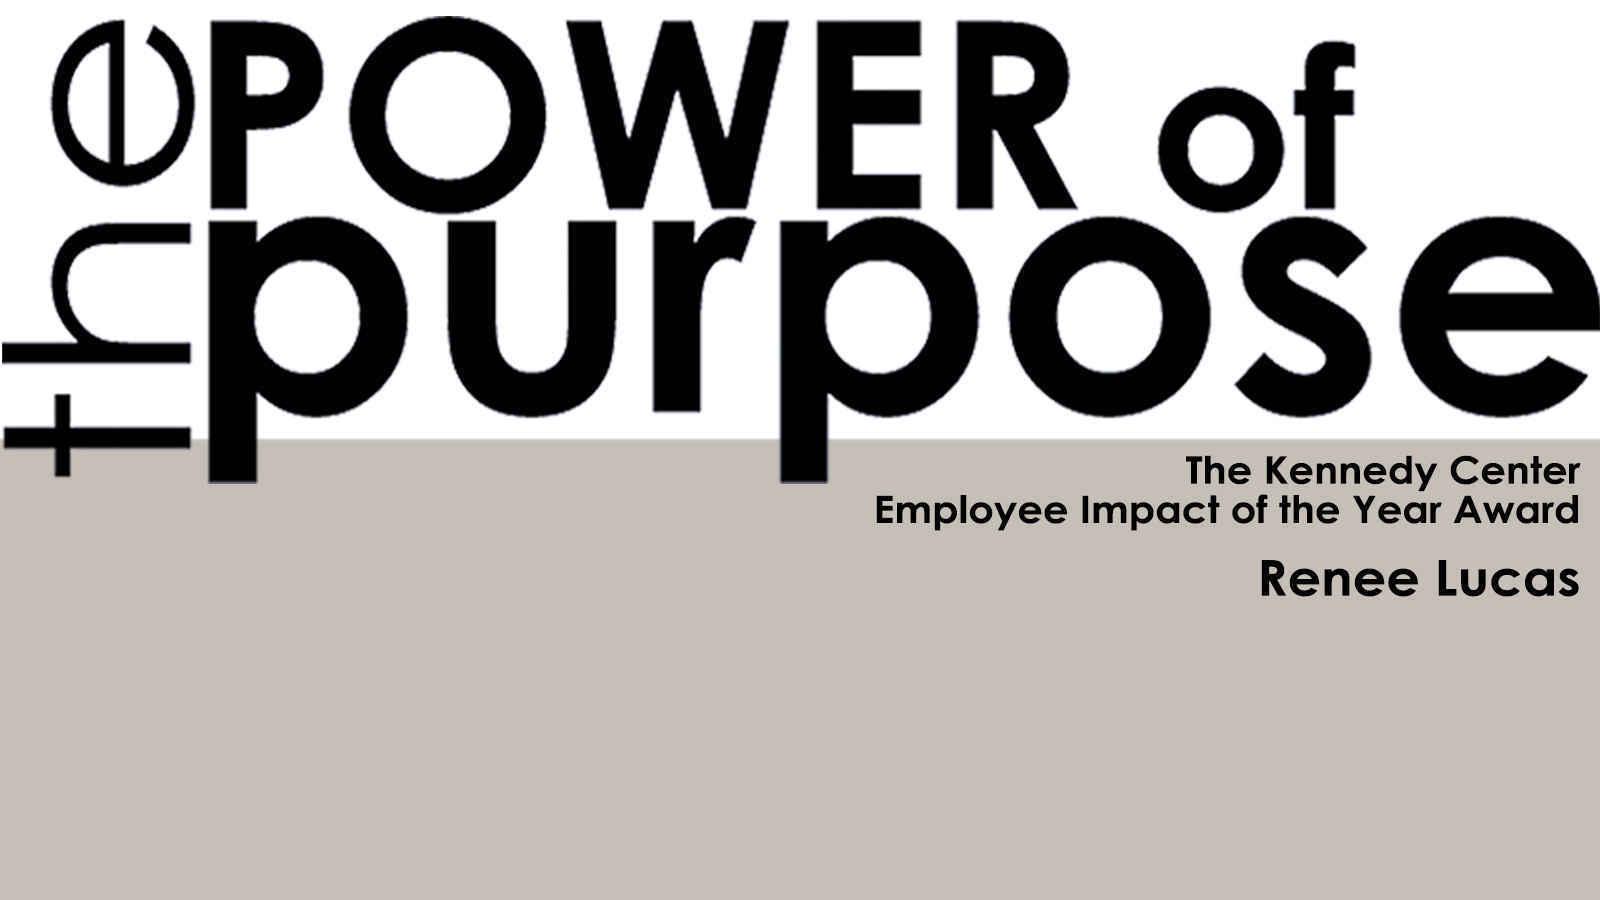 Make a gift to Honor and Congratulate Renee Lucas, Employee Impact Award winner image